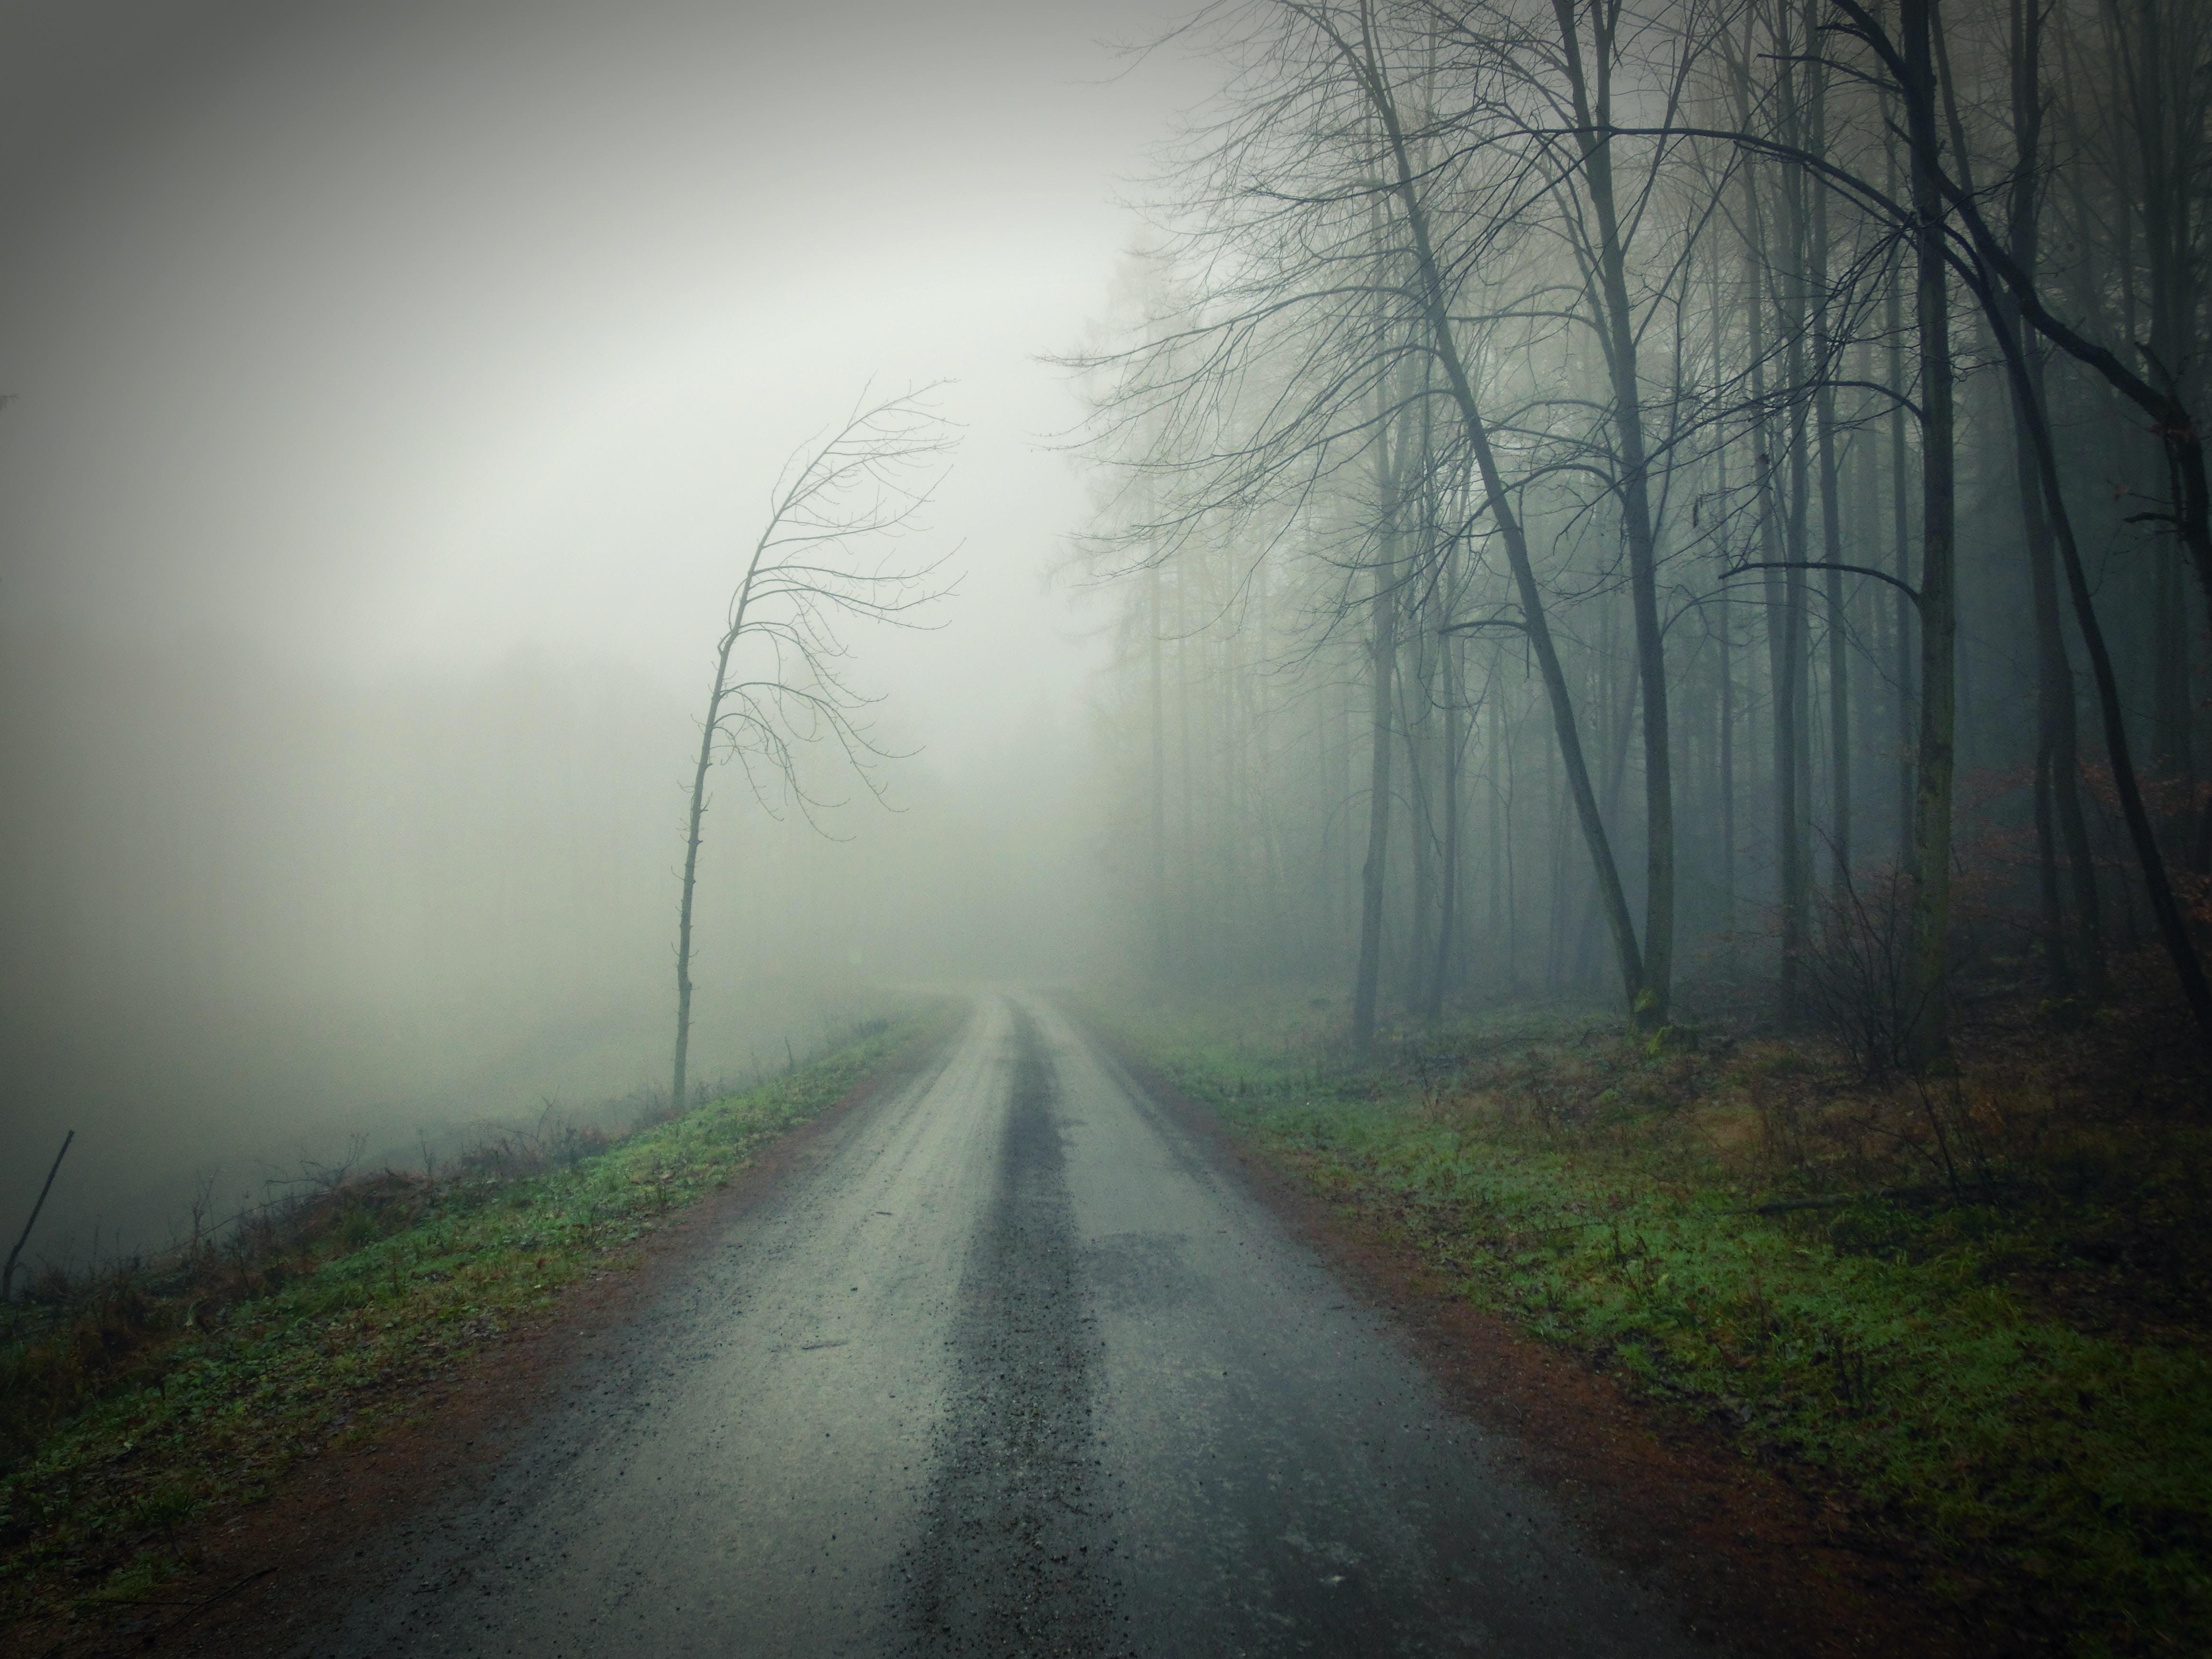 gray road beside bare trees during fog